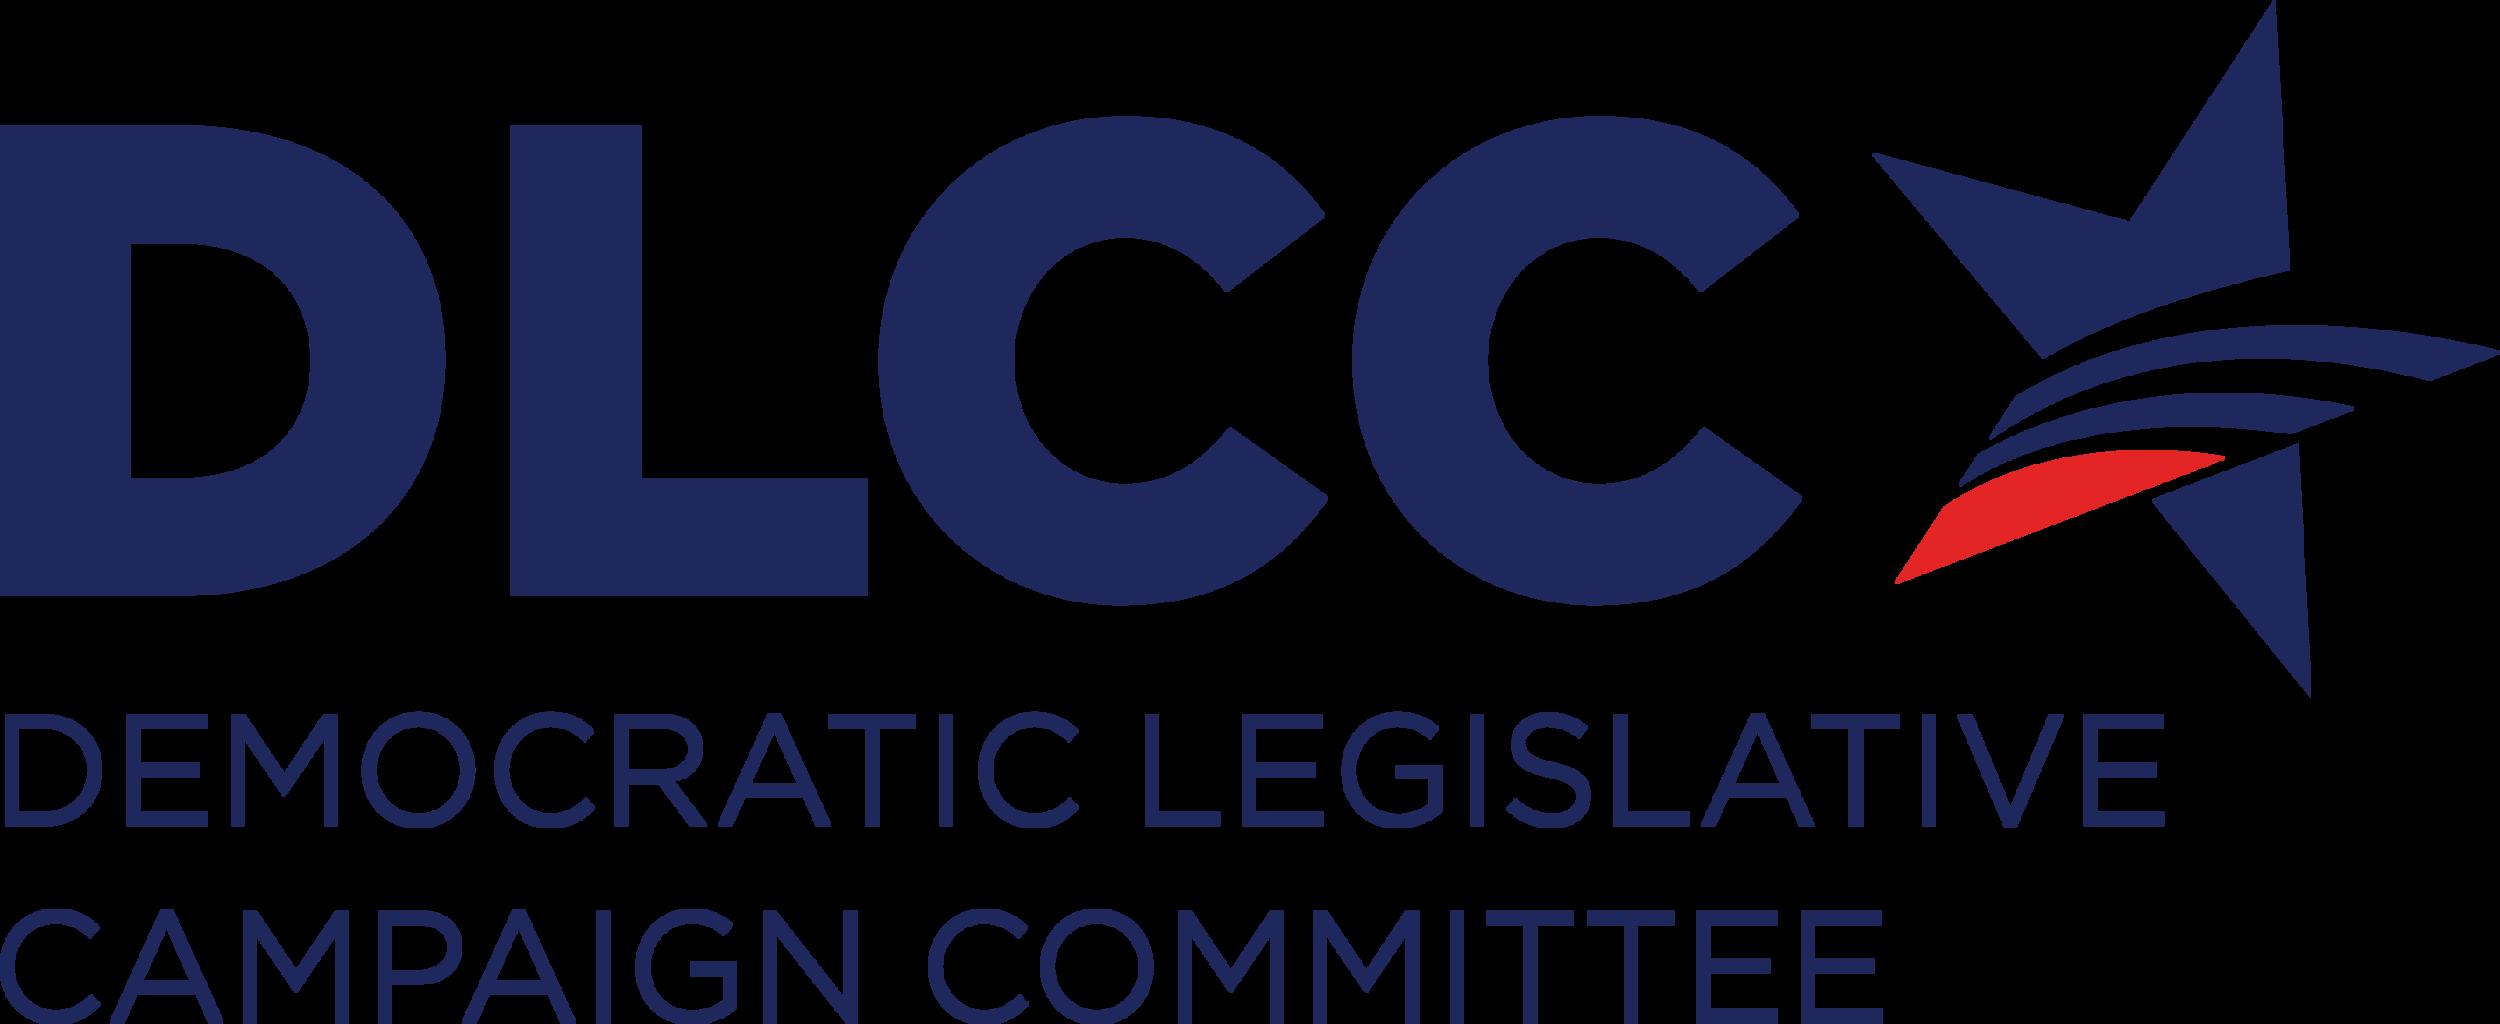 DLCC-Logo-FINAL-4-Color.png